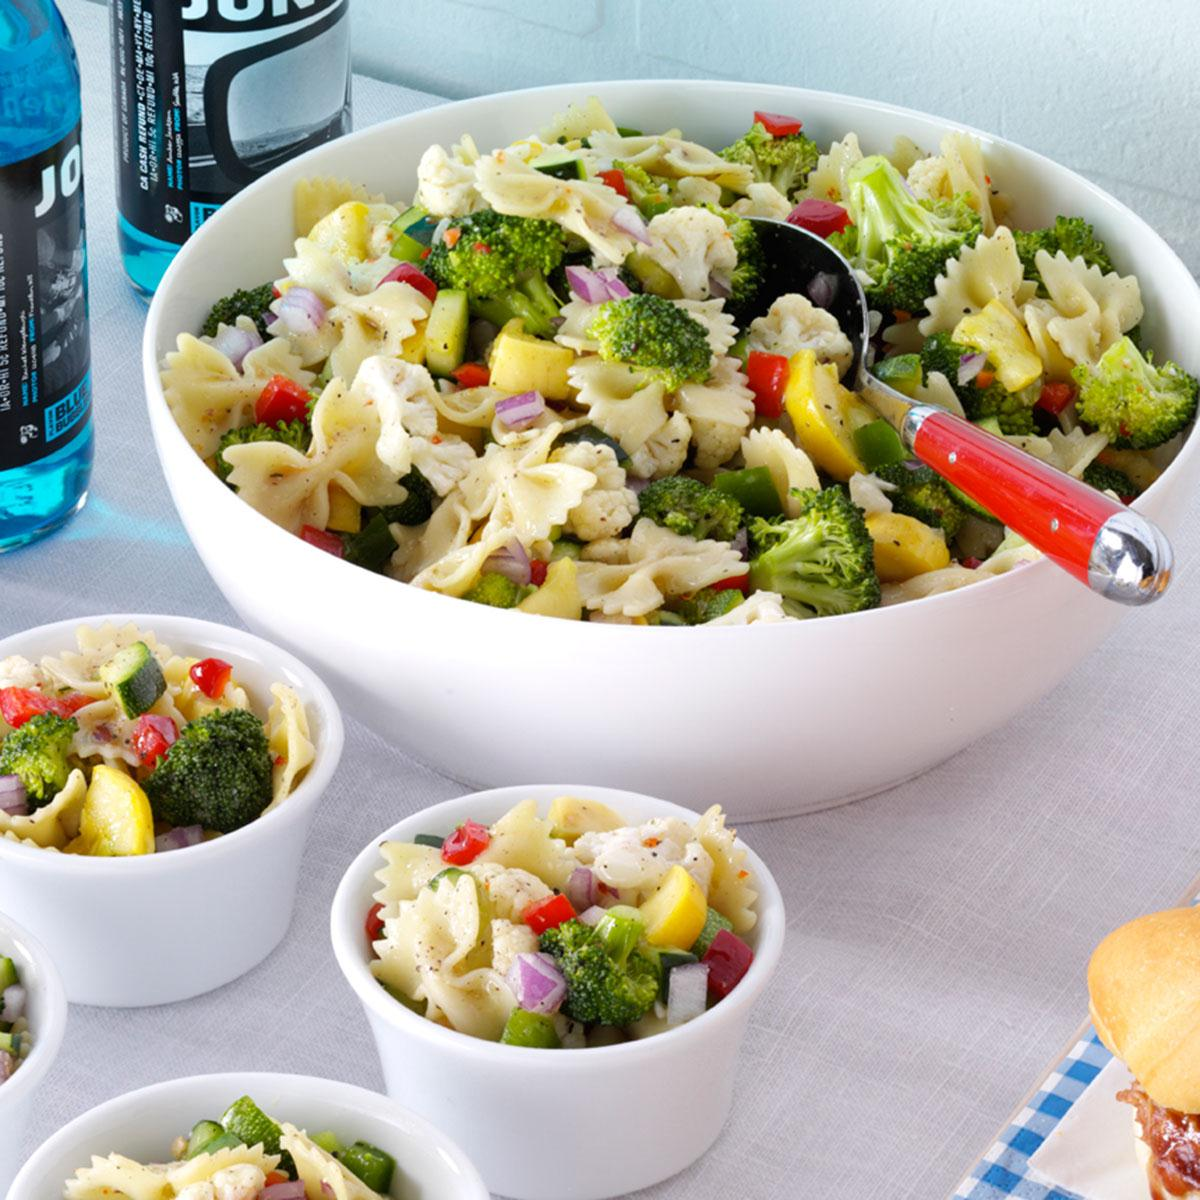 Garden bow tie salad recipe taste of home for Ina garten summer garden pasta